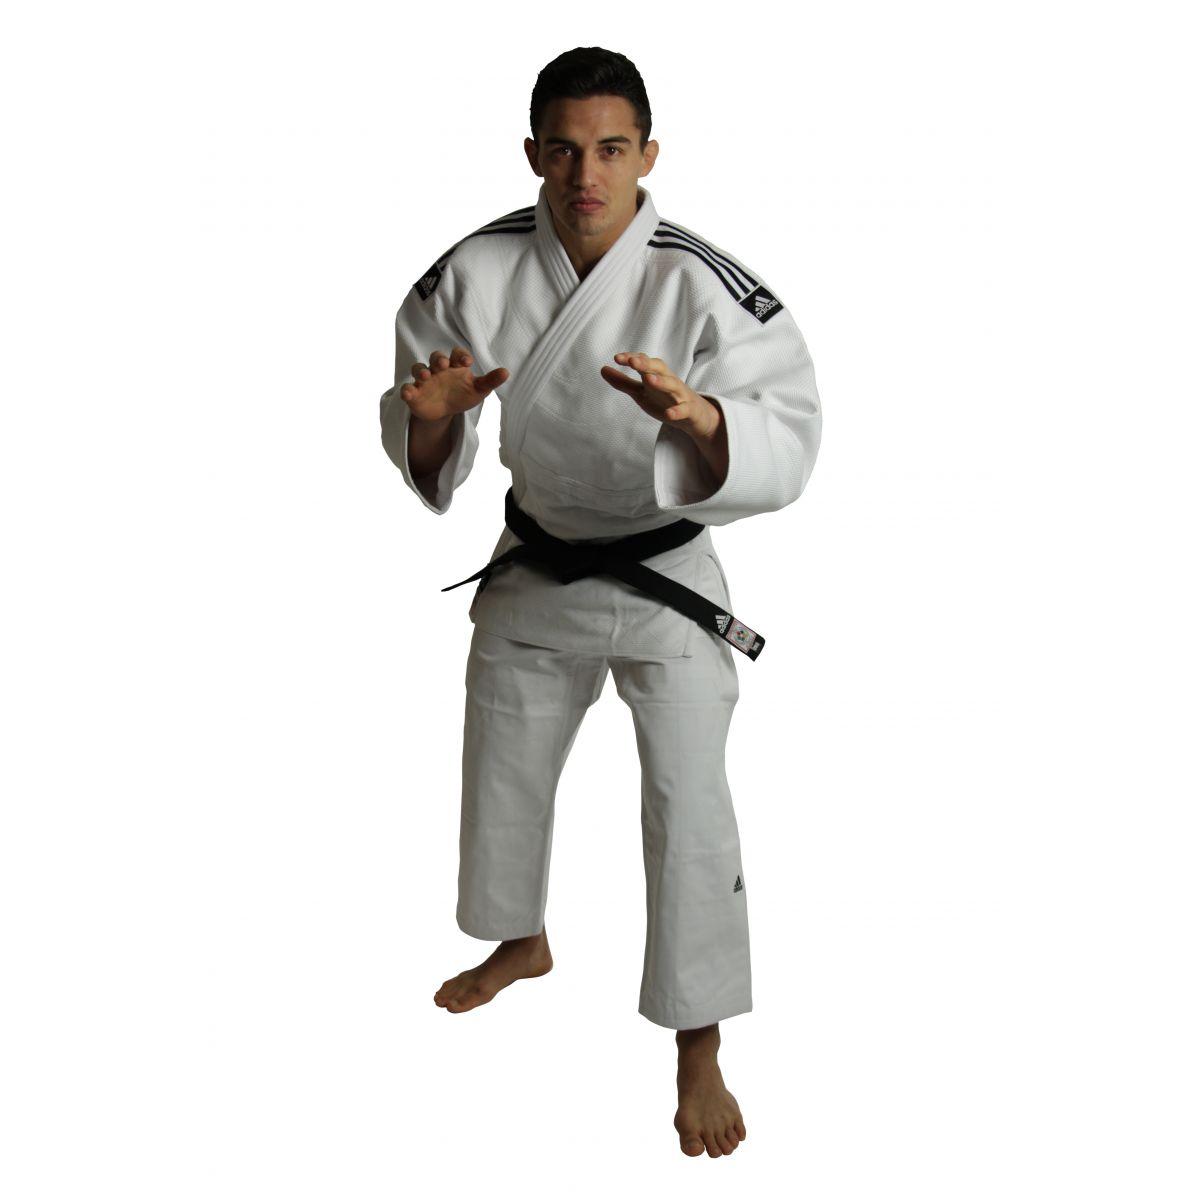 Kimono Judô Champion II Adidas com novo selo eletronico da IJF